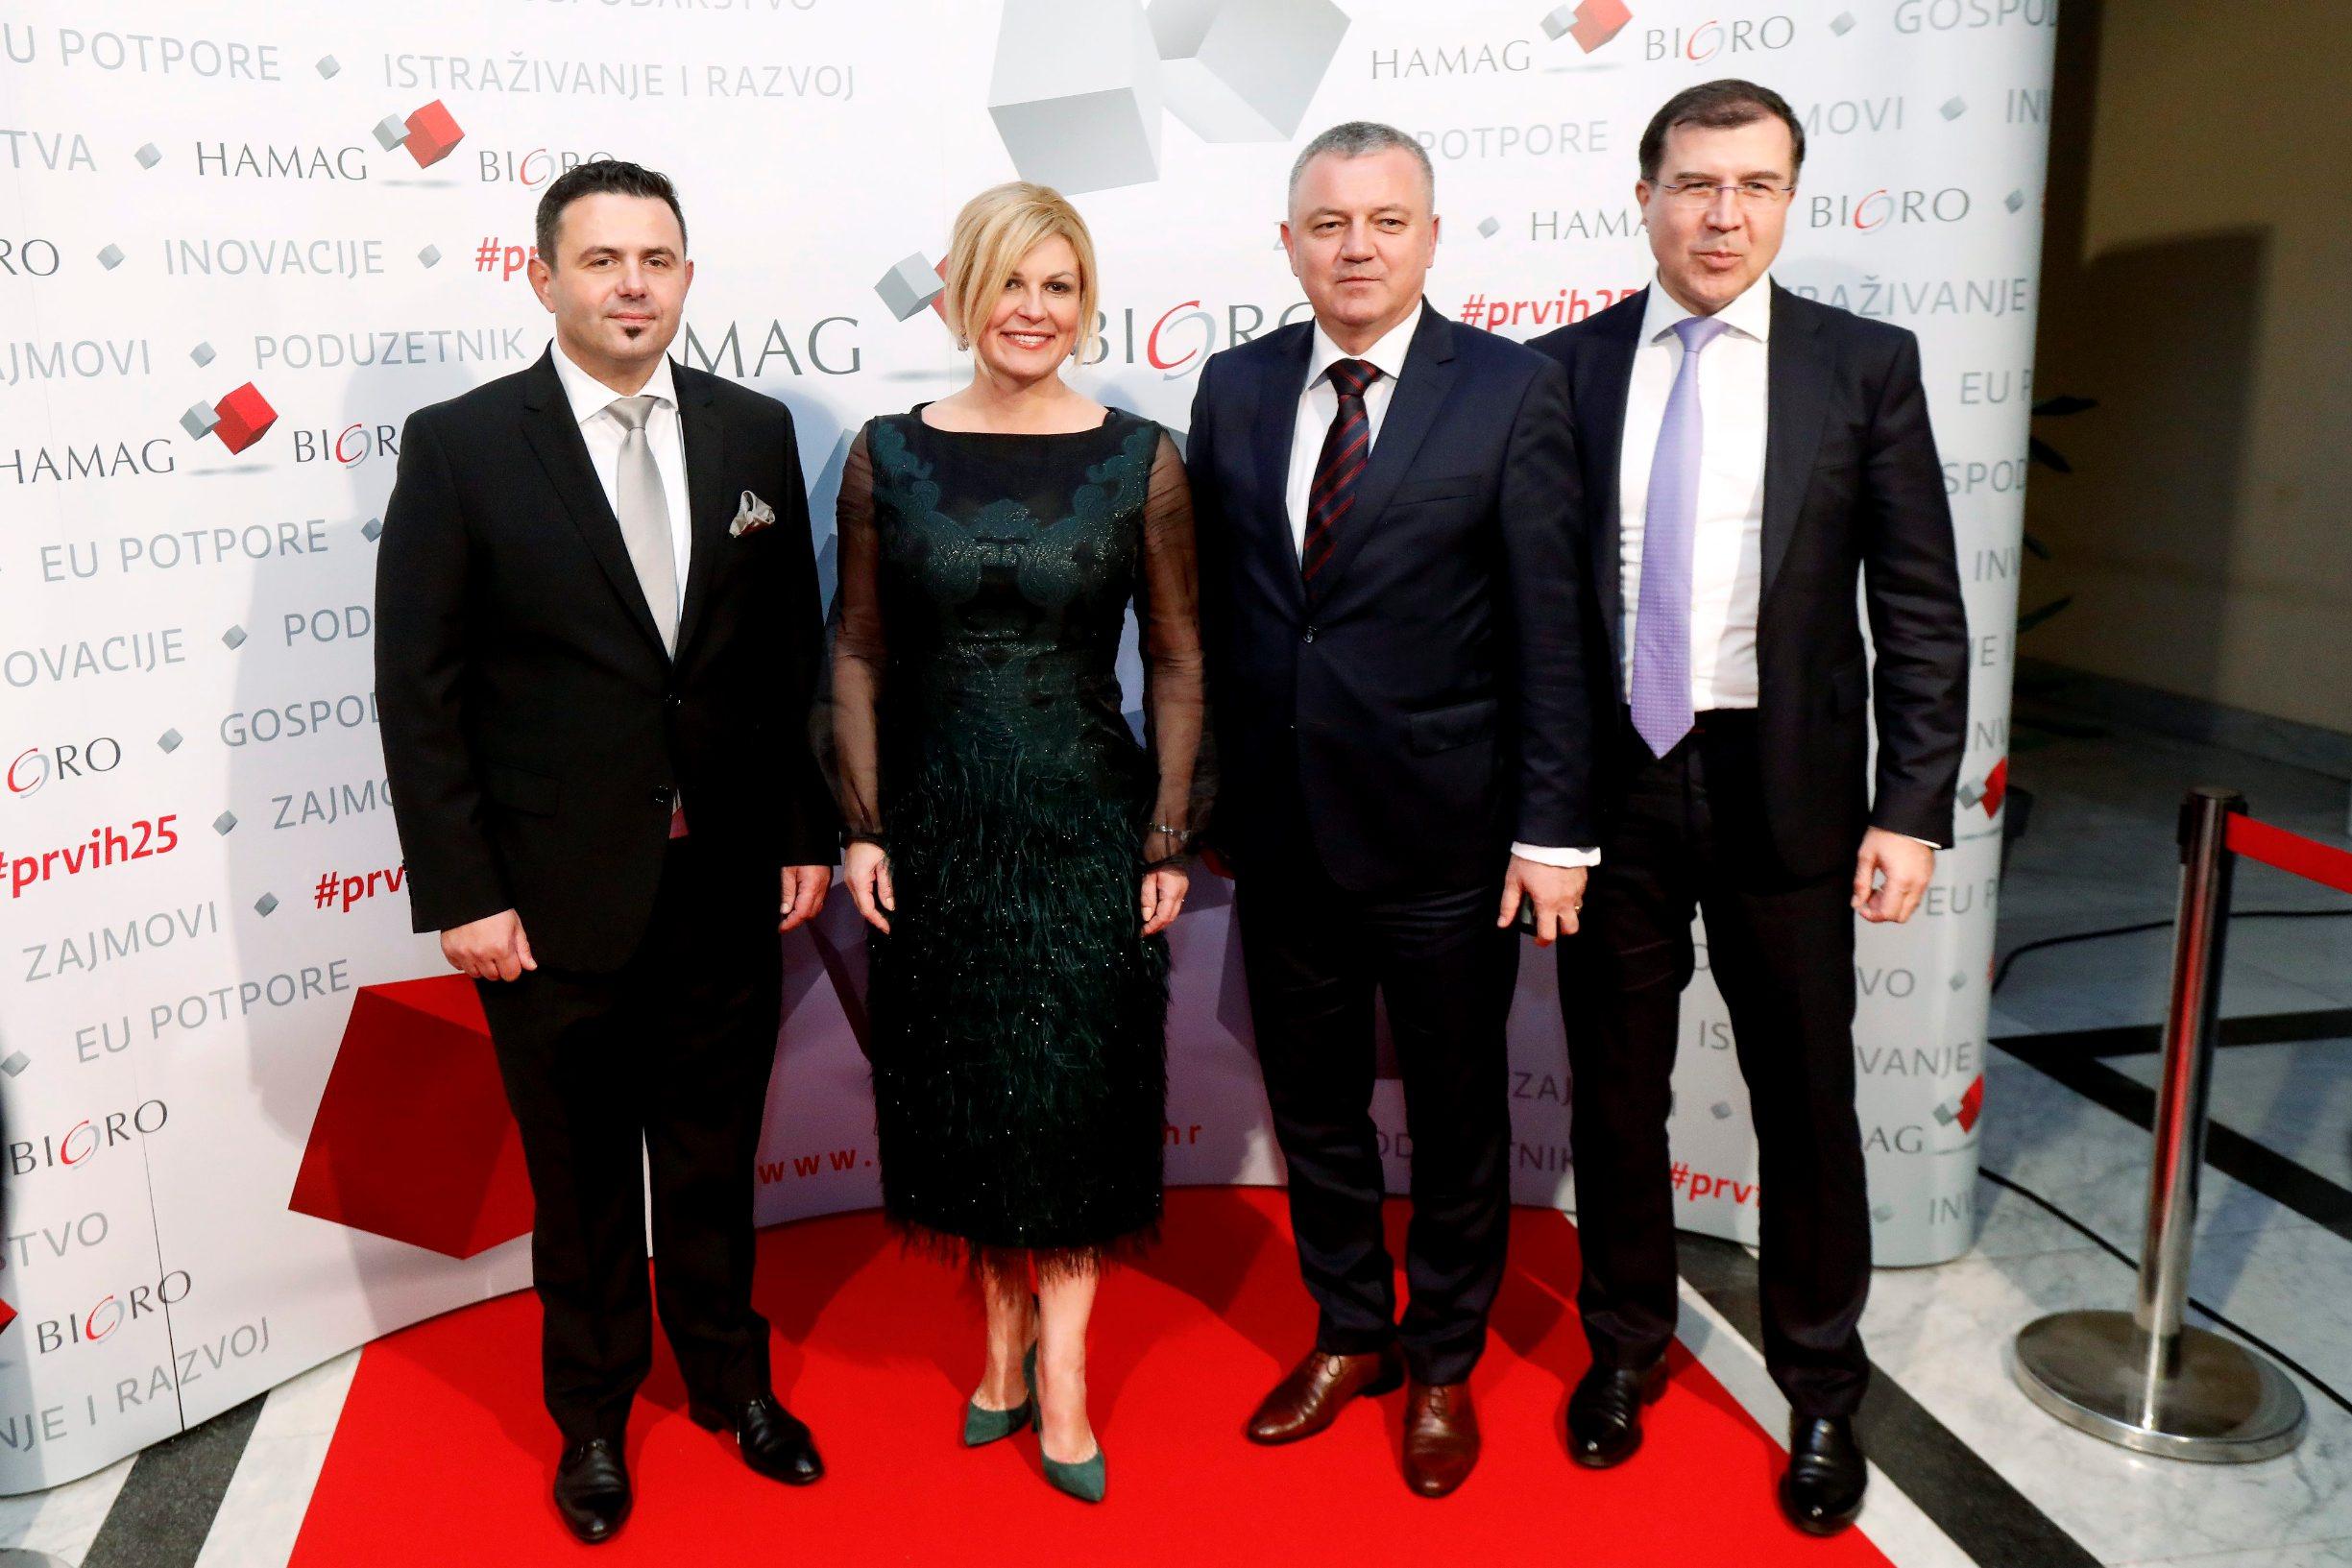 Vjeran Vrbanec - predsjednik Uprave Hamag Bicro, Kolinda Grabar Kitarović, Darko Horvat, Ivan Domagoj Milošević.